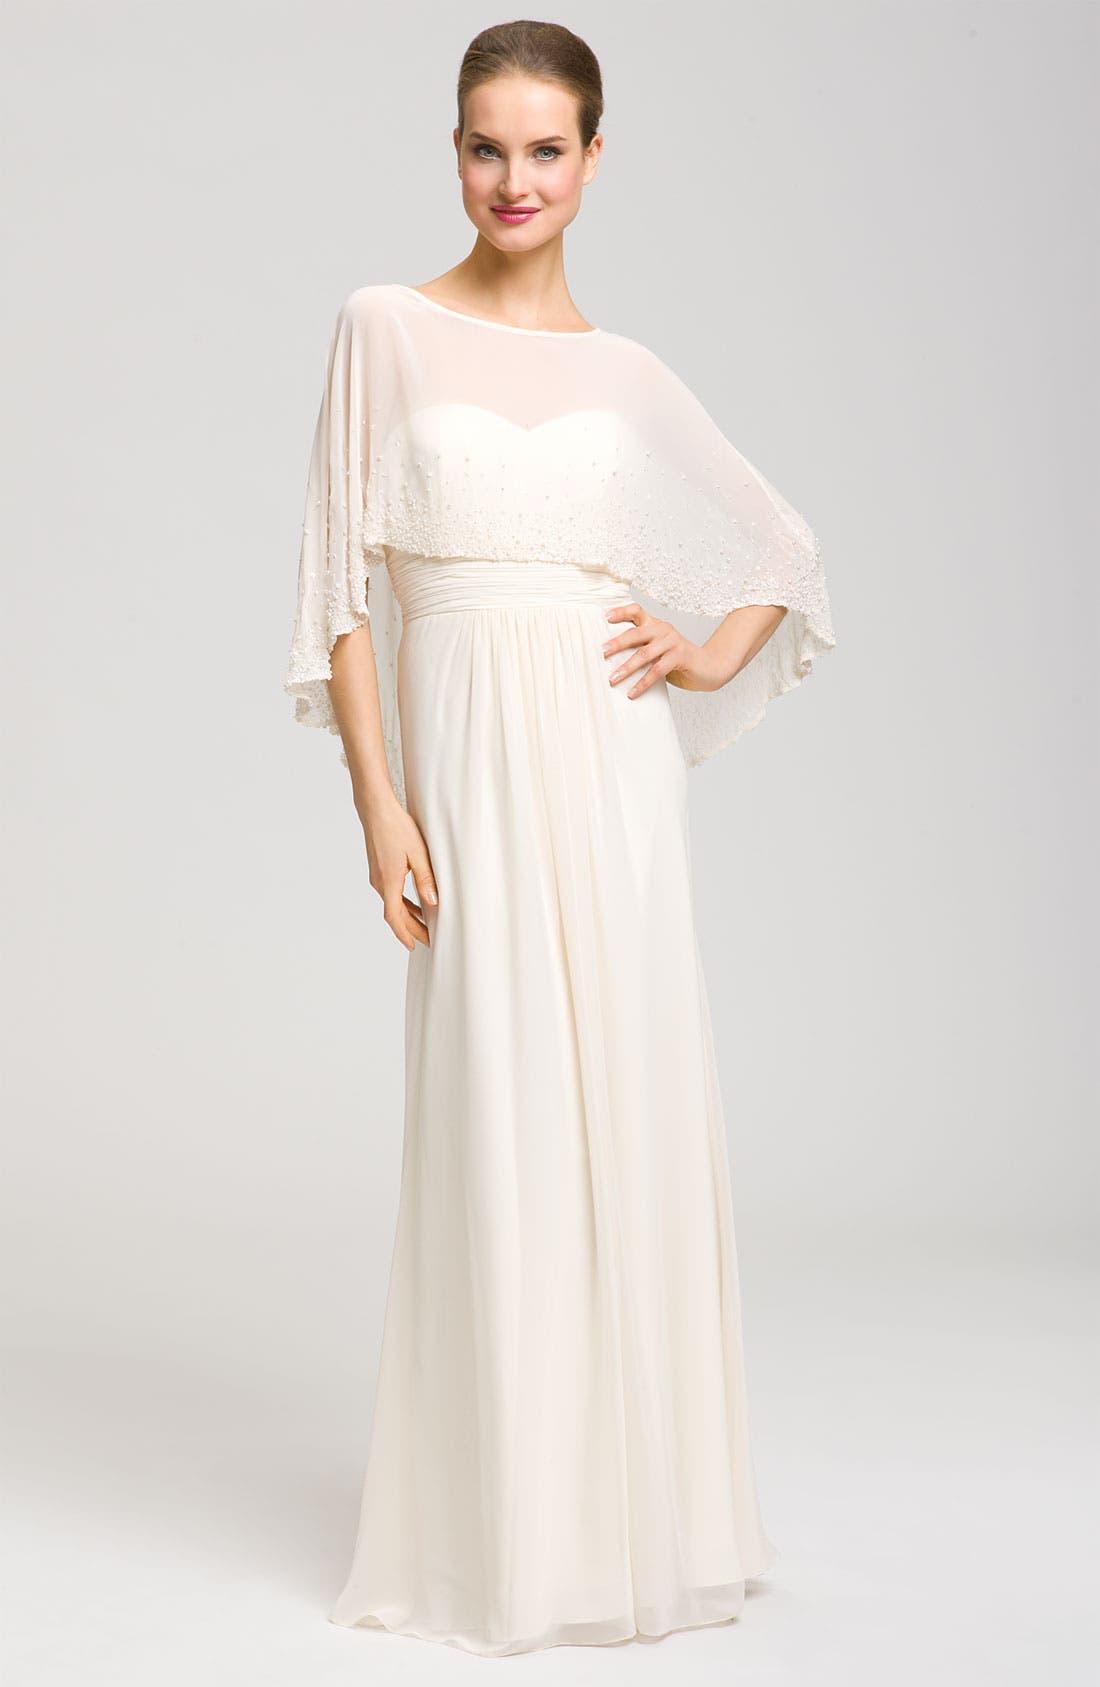 Alternate Image 1 Selected - Aidan Mattox Sweetheart Gown & Beaded Cape